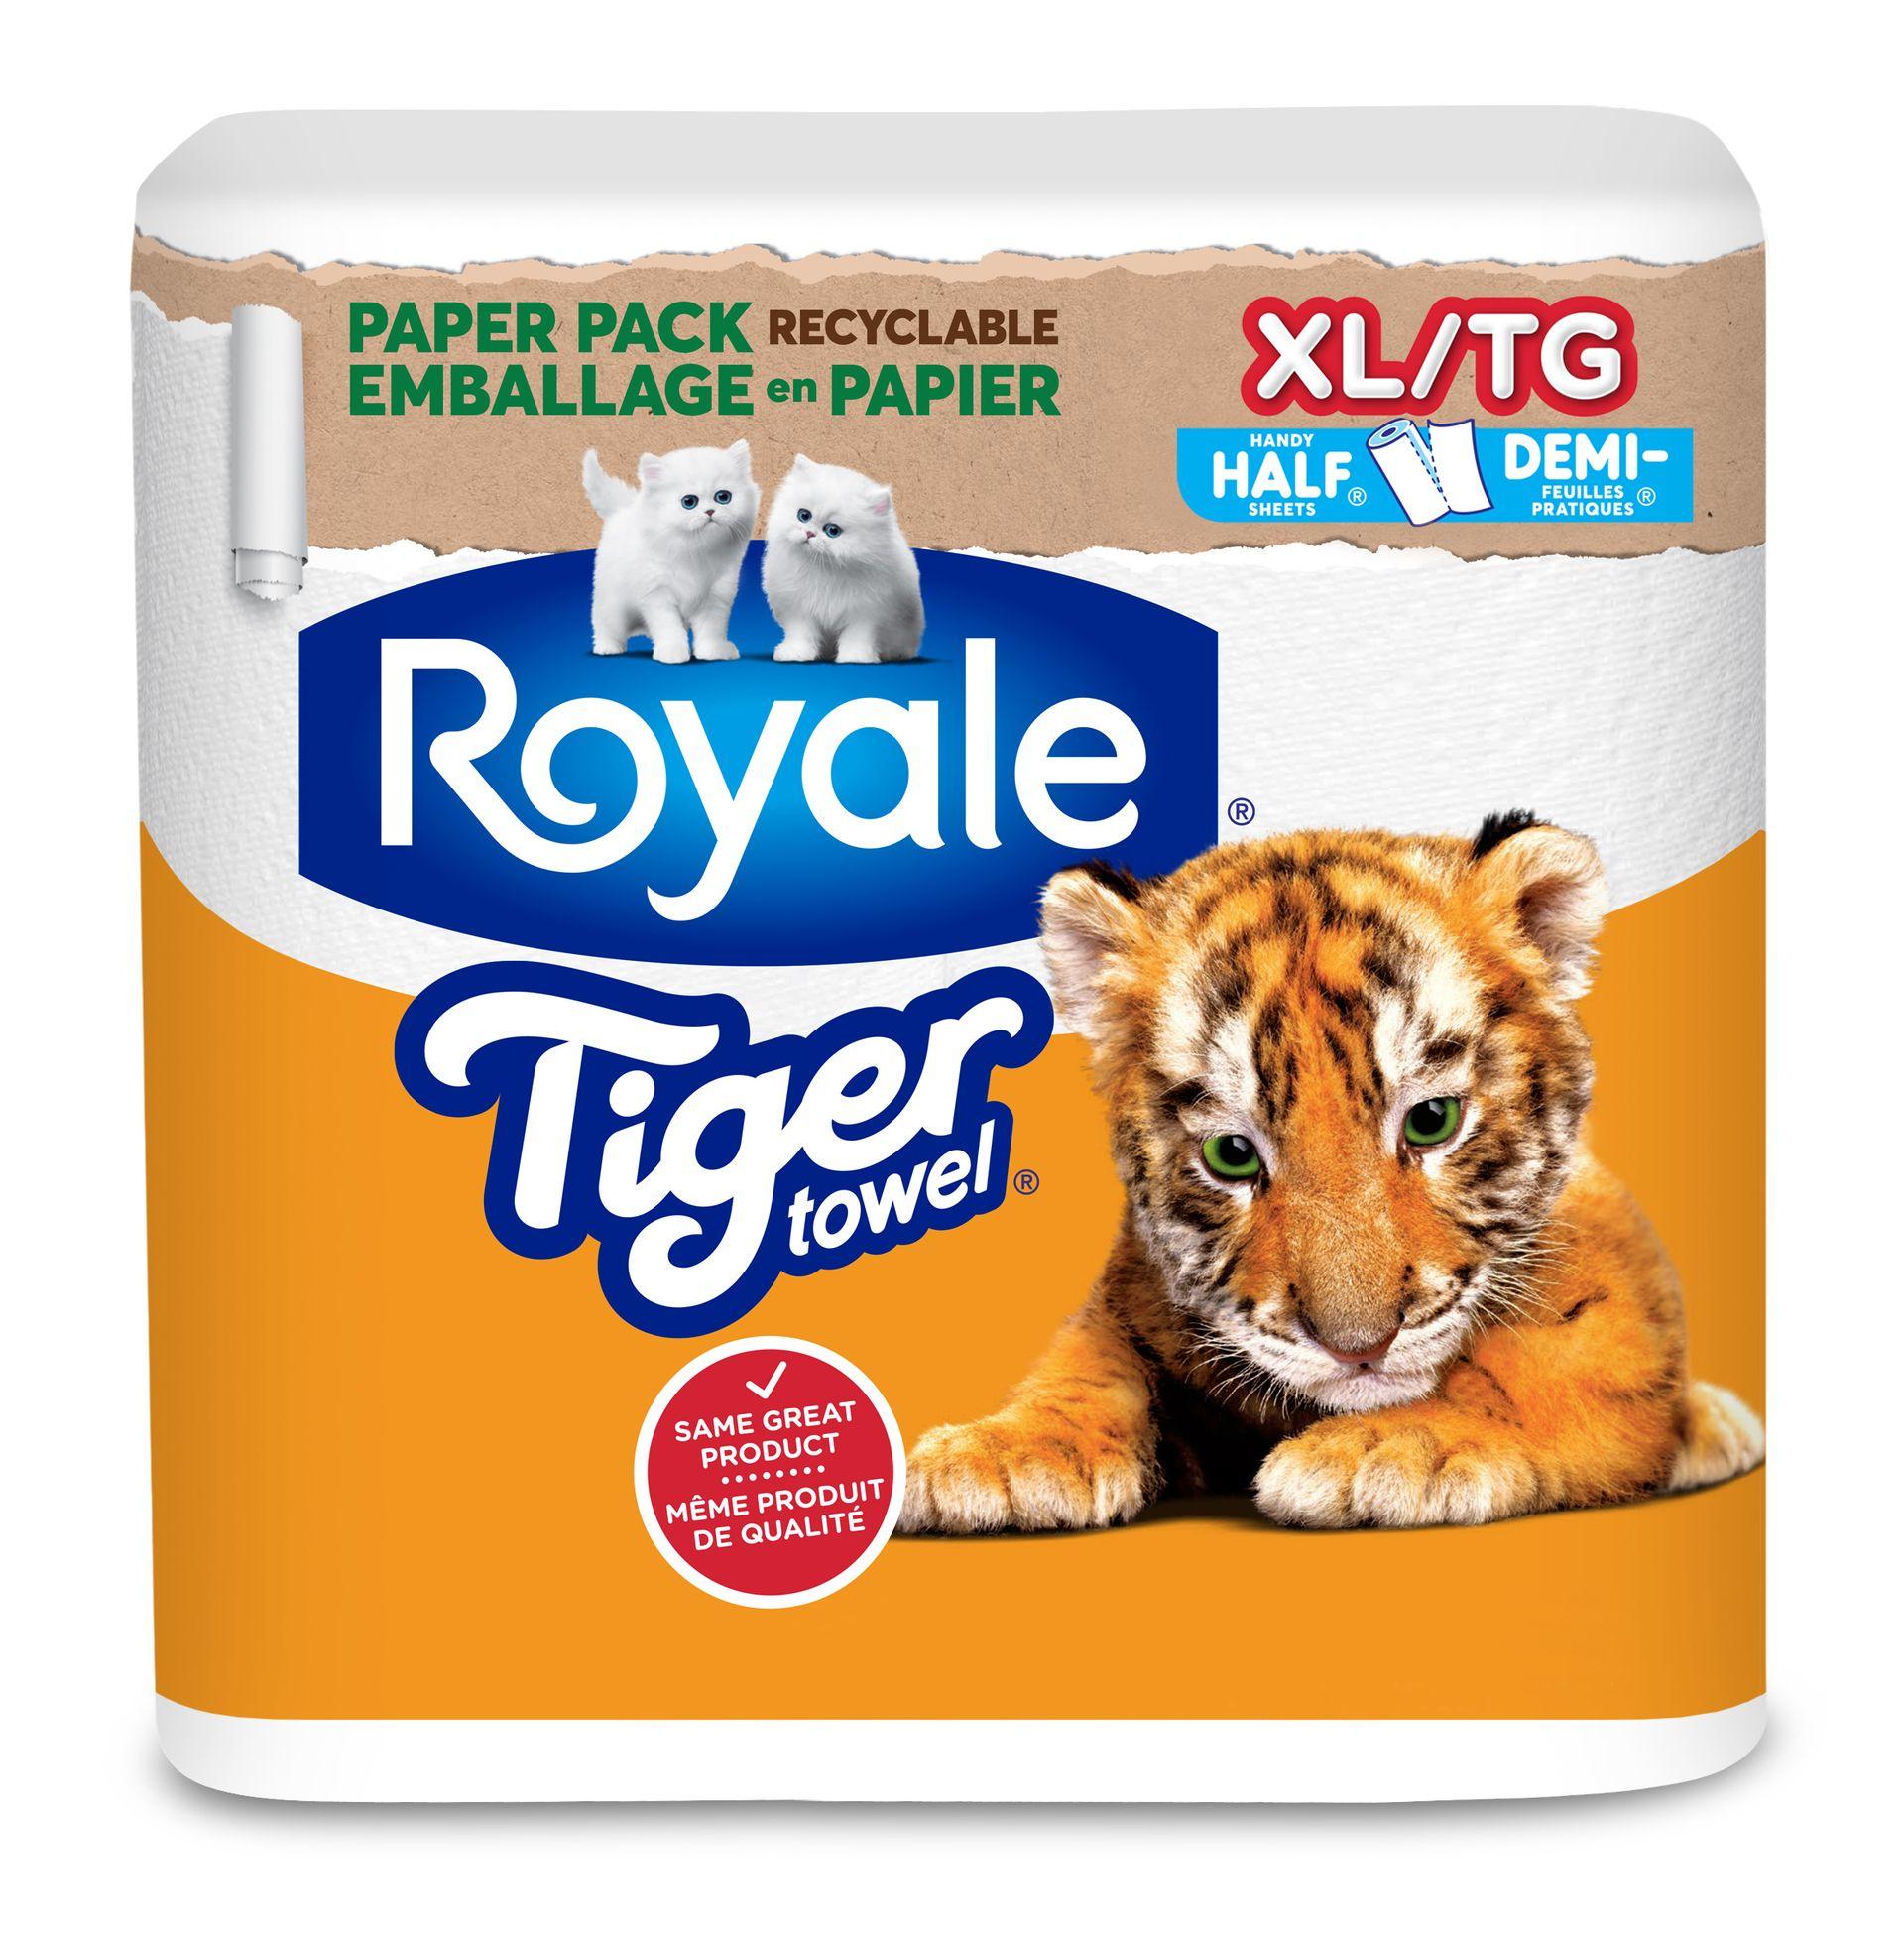 ROYALE® Tiger Towel® Regular Rolls: Handy Half Sheets®